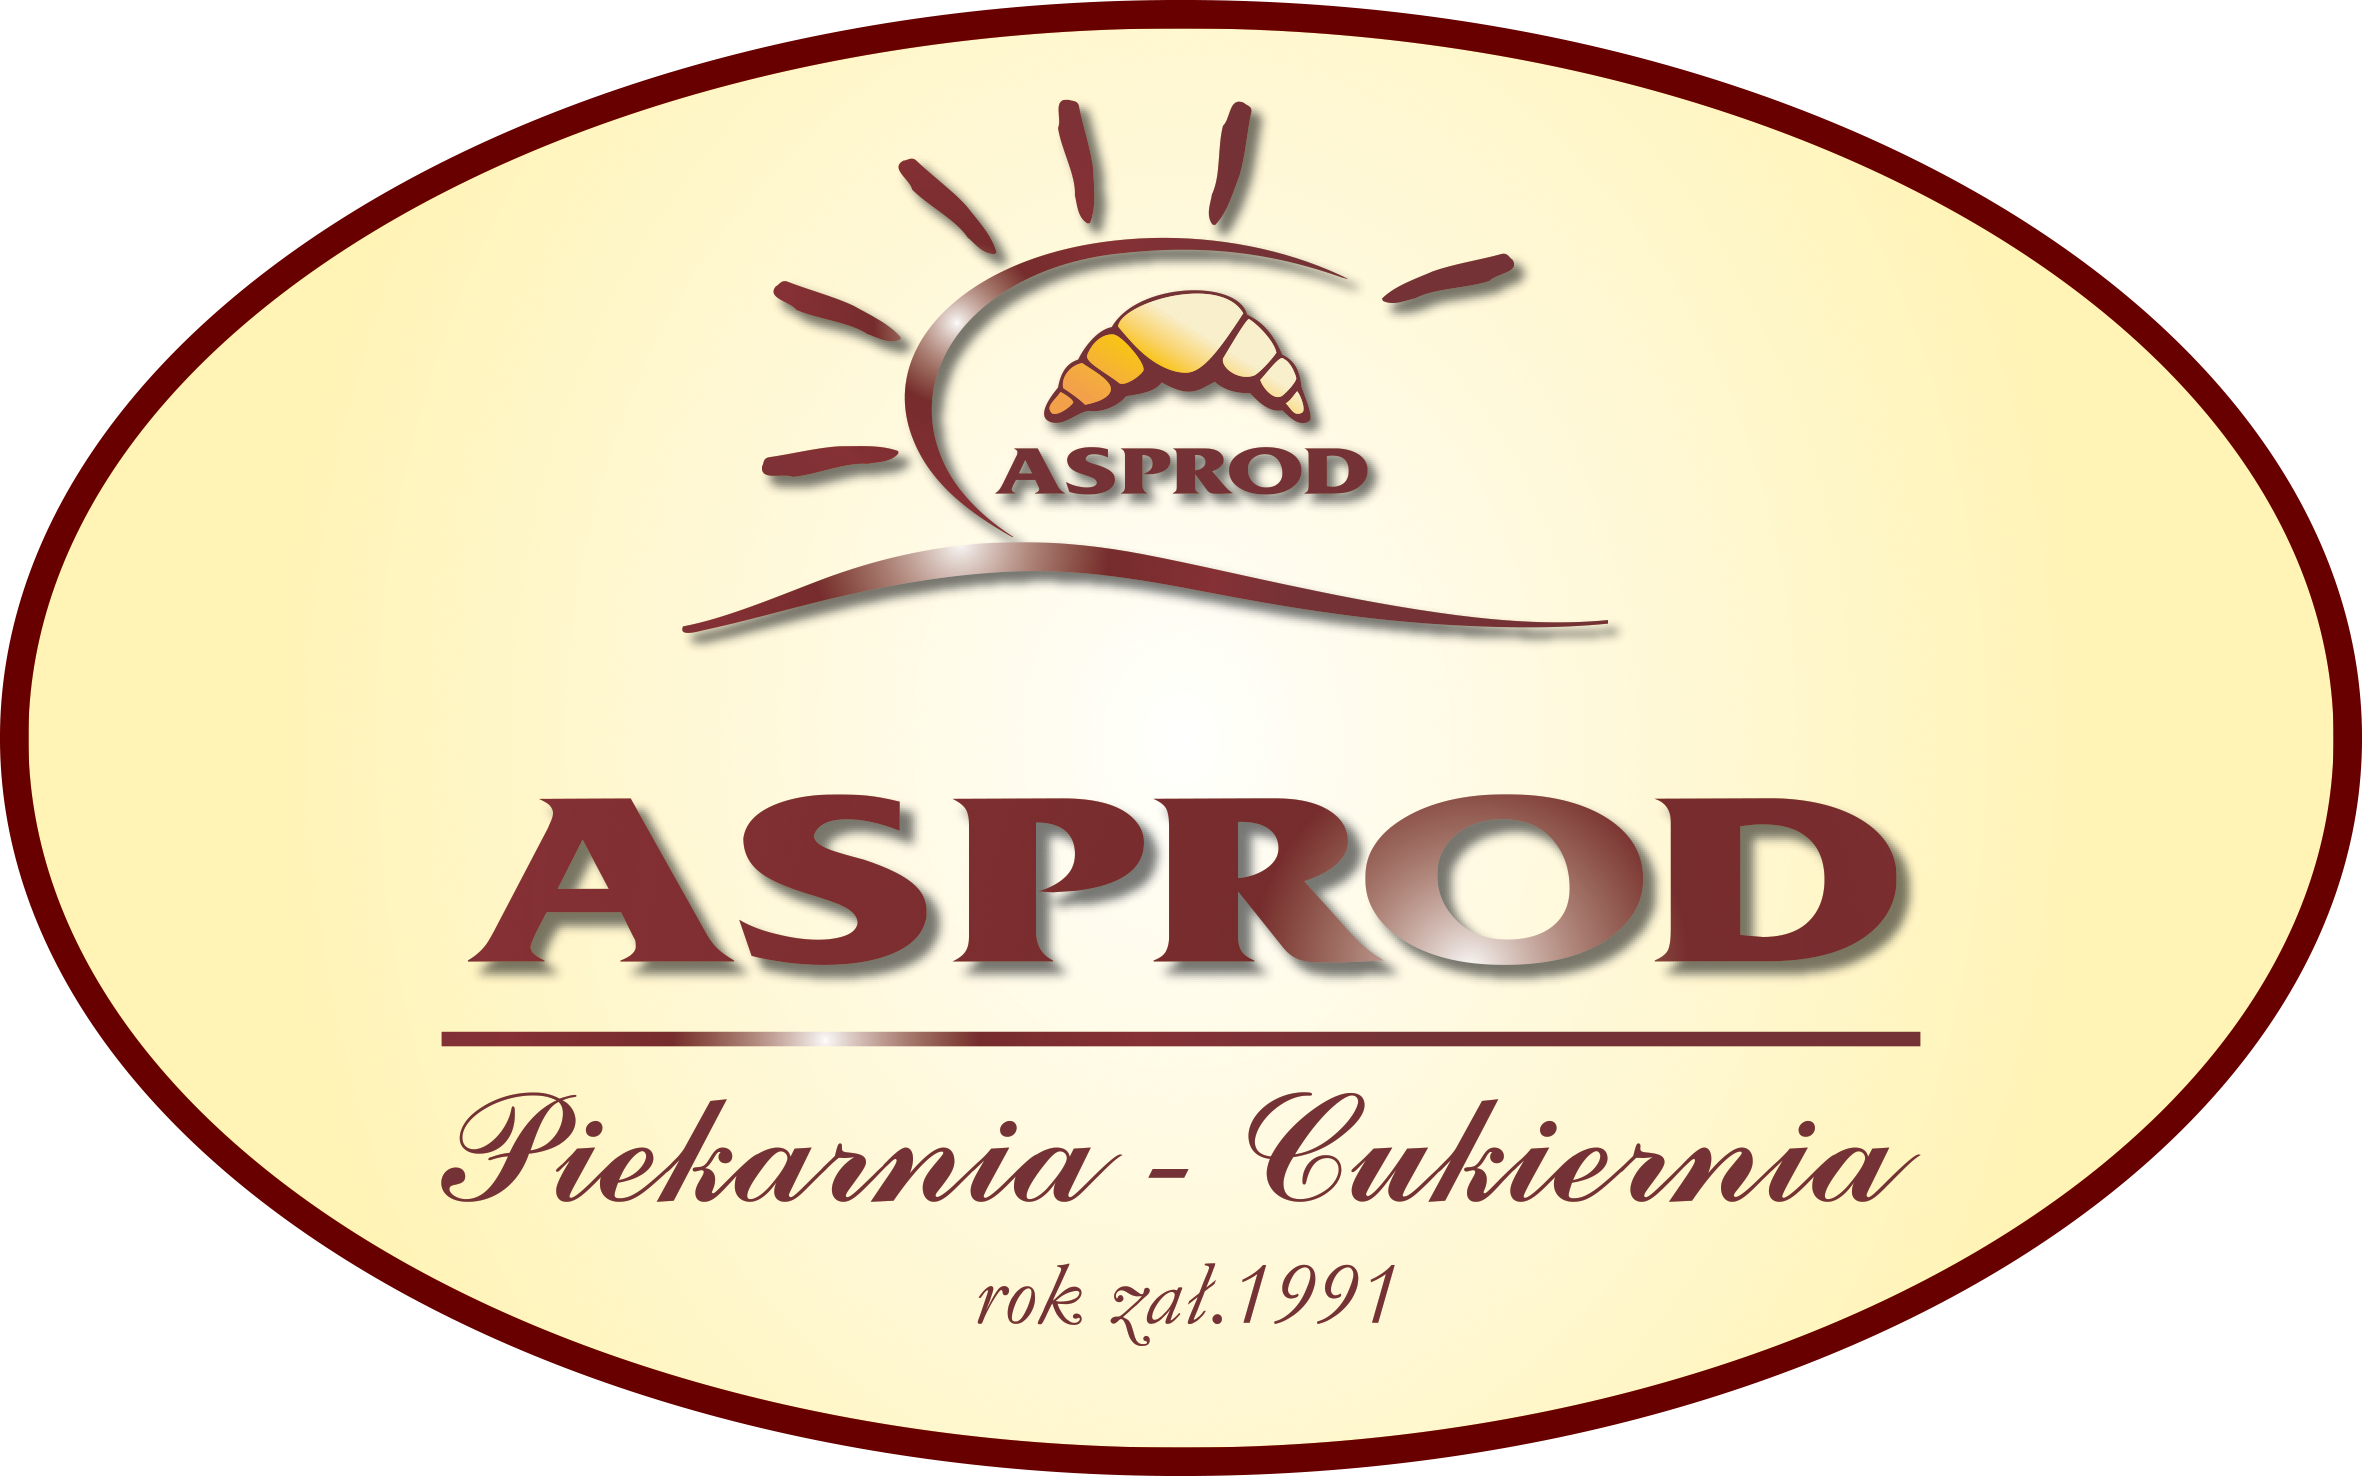 Asprod